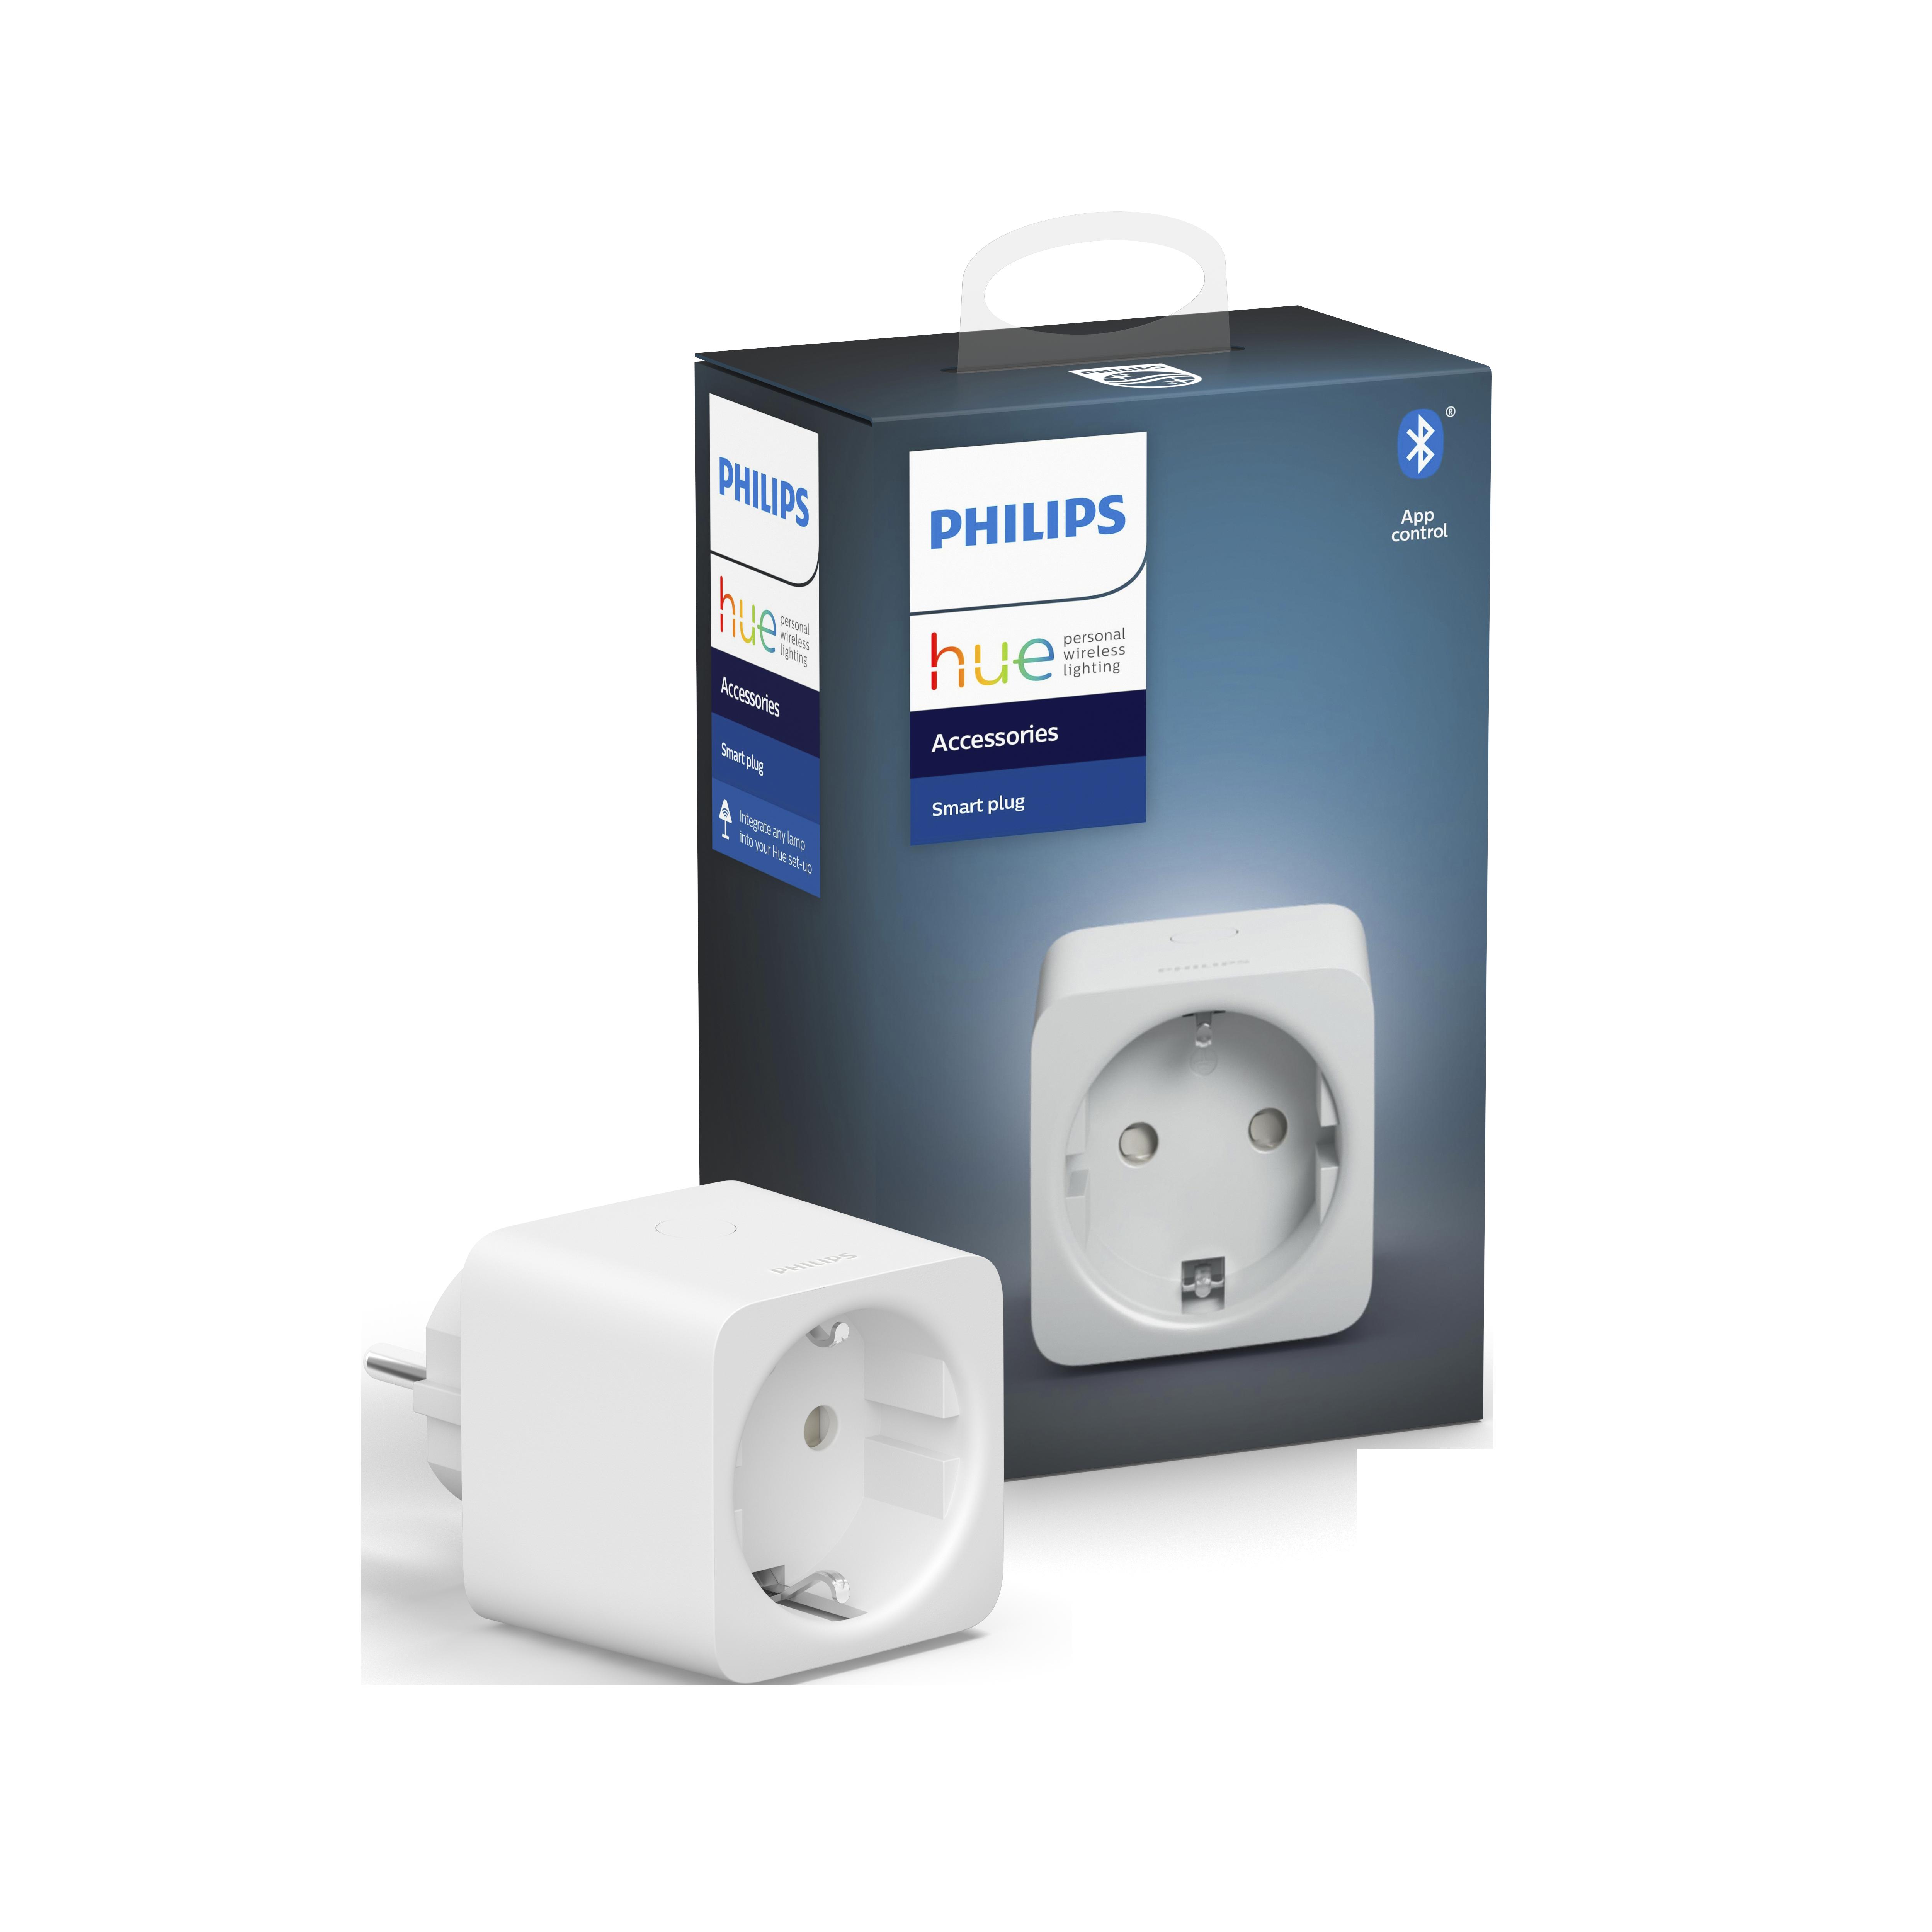 Philips Hue - Smart Plug Steckdosenplug